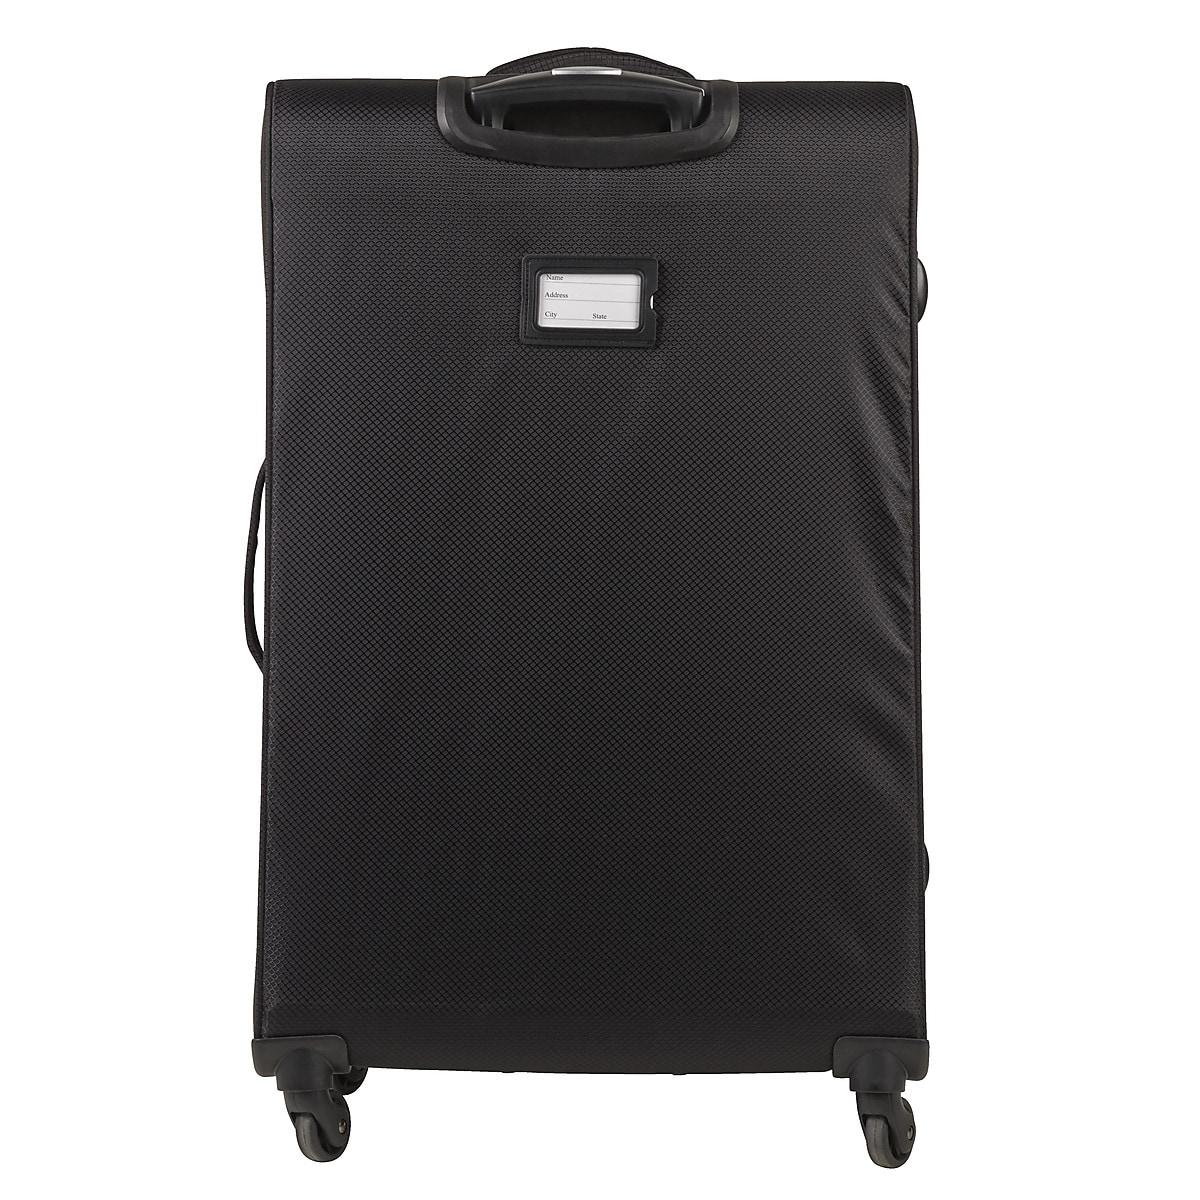 Resväska Asaklitt Lightweight, svart